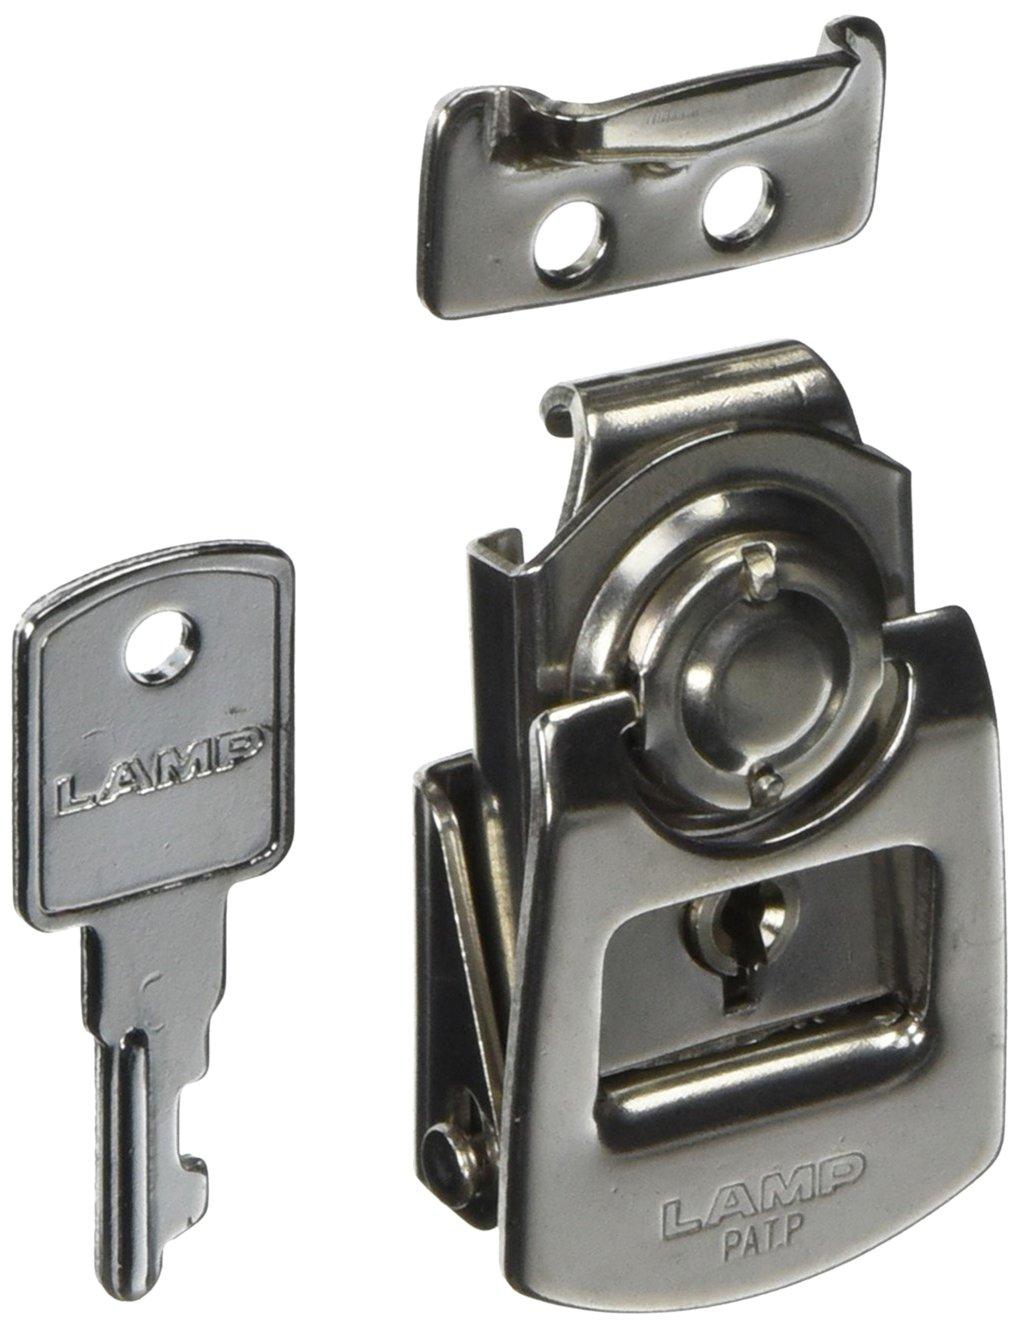 Stainless Steel 304 Mini Draw Latch, Plain Finish, Key Locking, 2 1/2'' Length (Pack of 1)